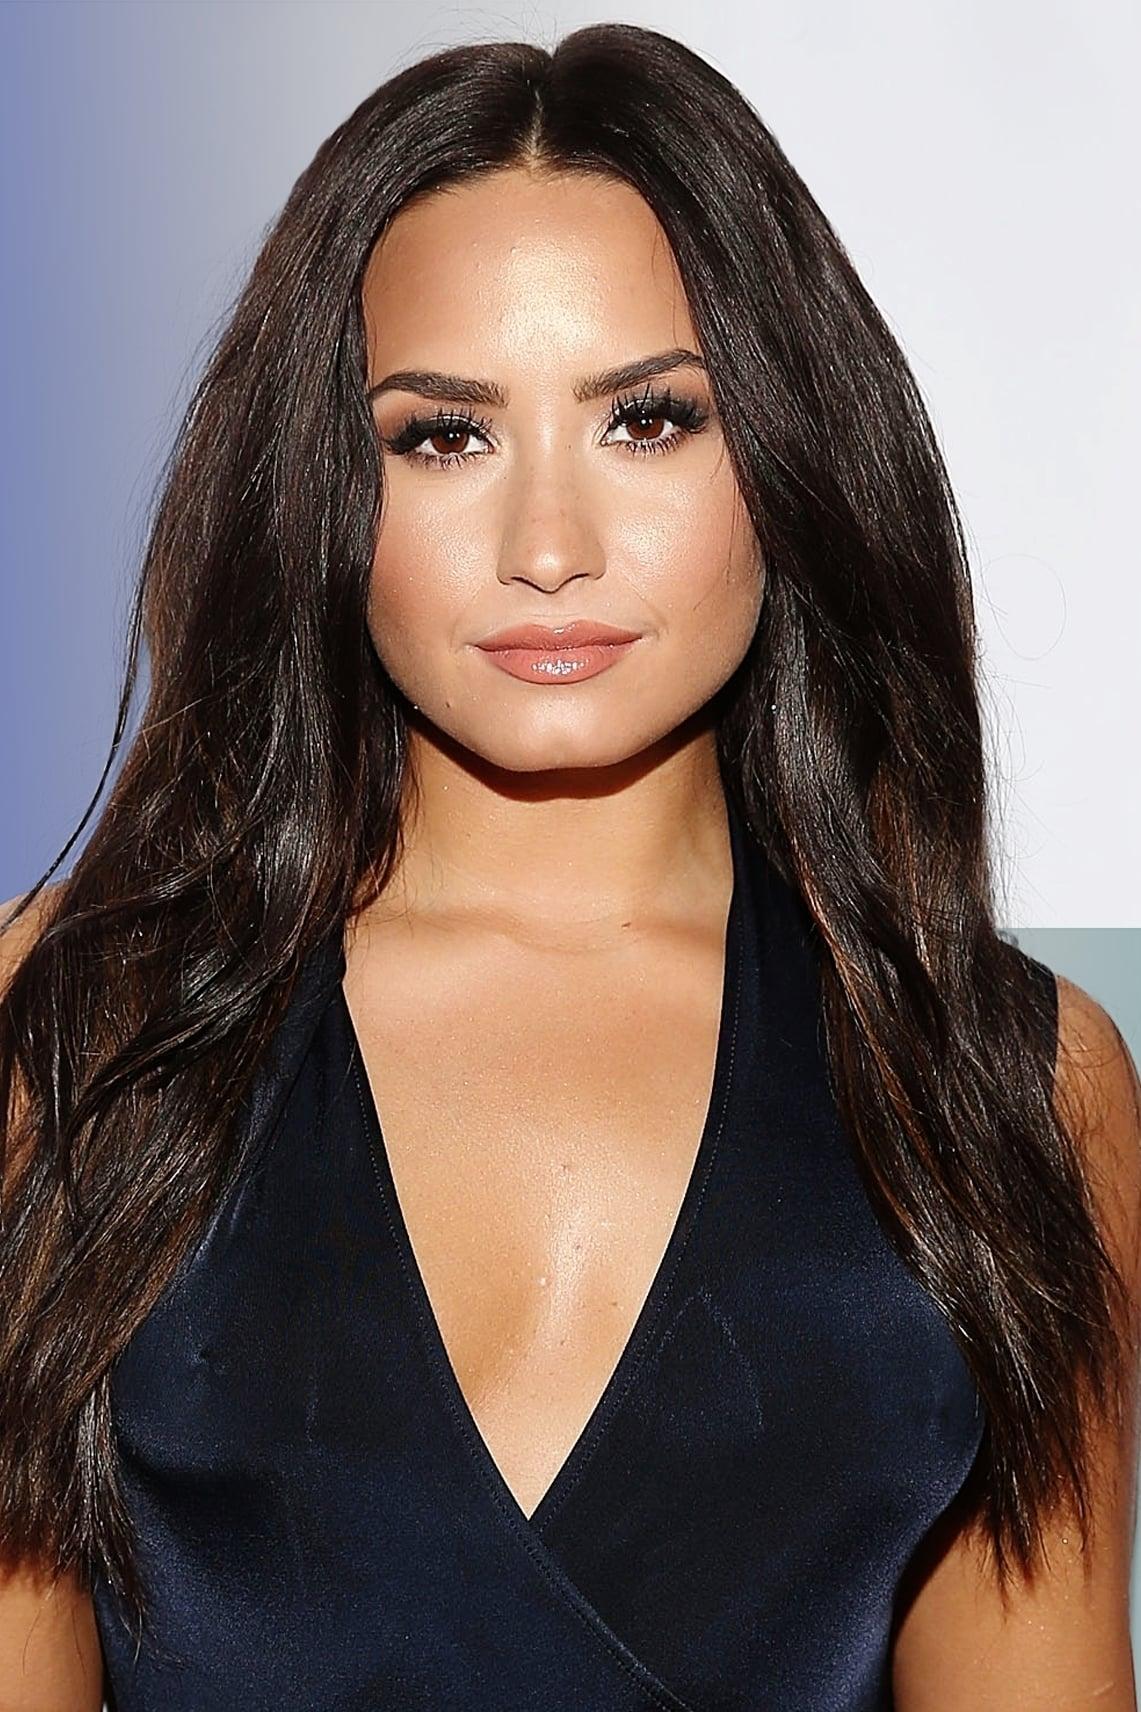 Demi Lovato nudes (33 photos) Leaked, 2018, braless